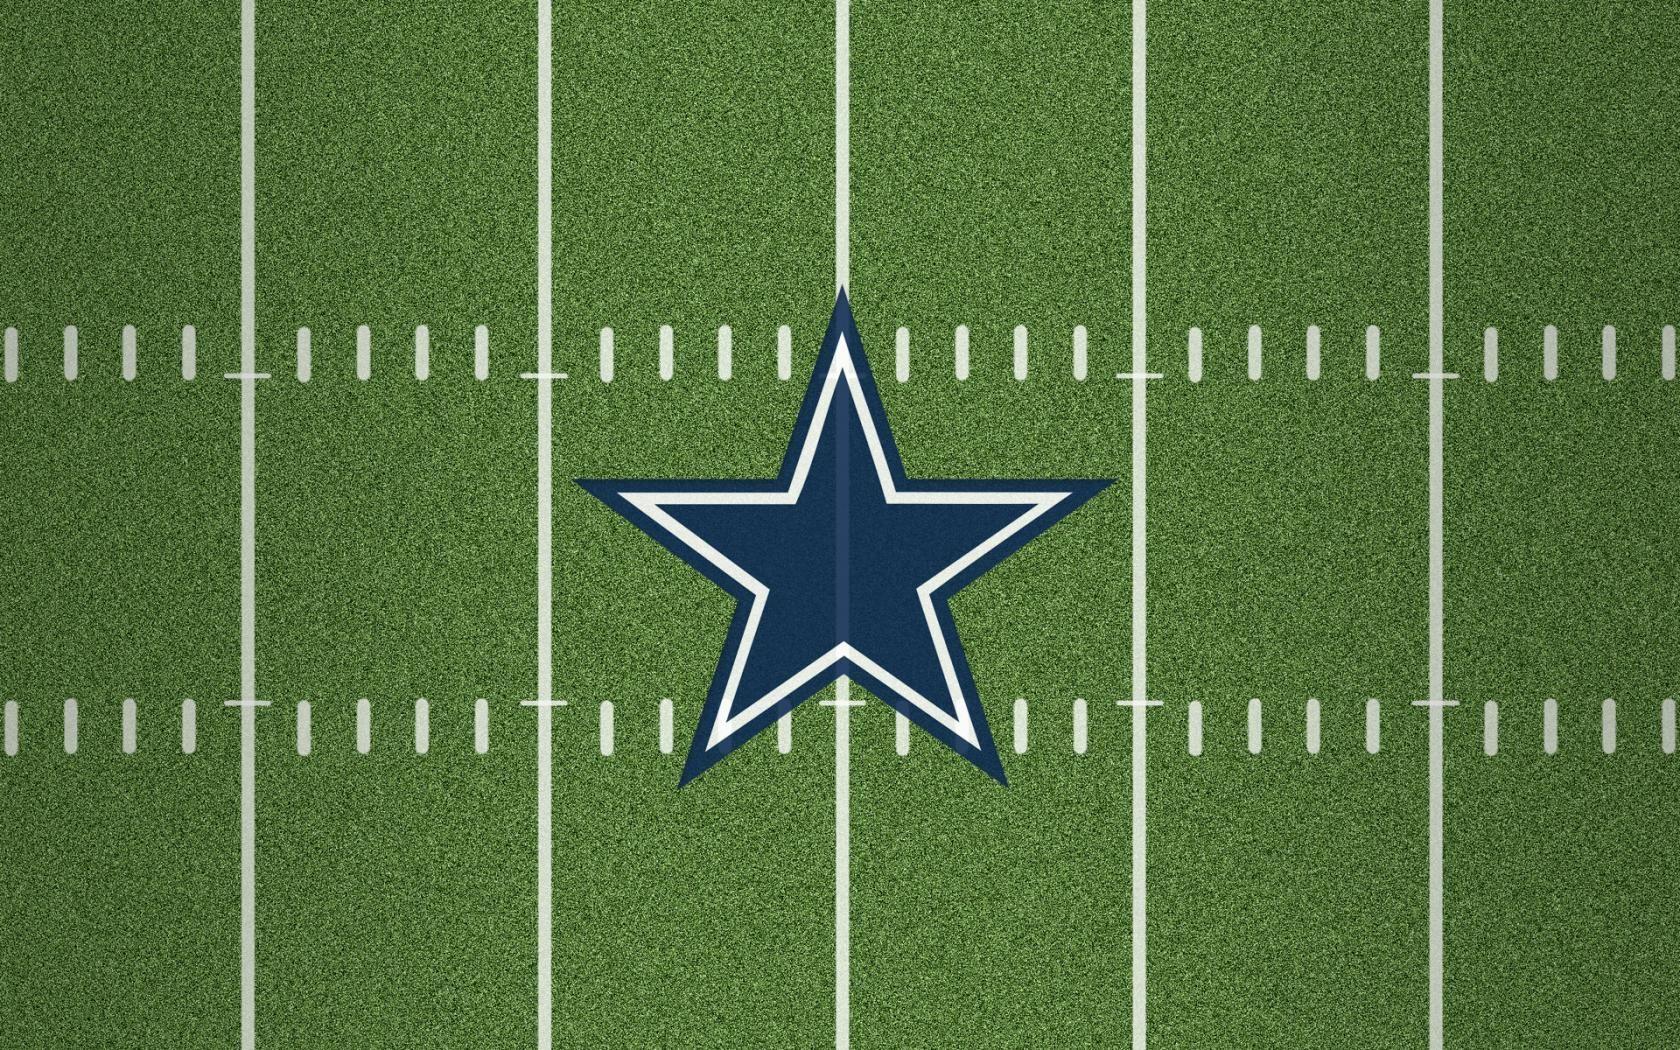 Dallas Cowboys Logo Wallpaper Full Hd Dallas Cowboys Wallpaper Dallas Cowboys Dallas Cowboys Images